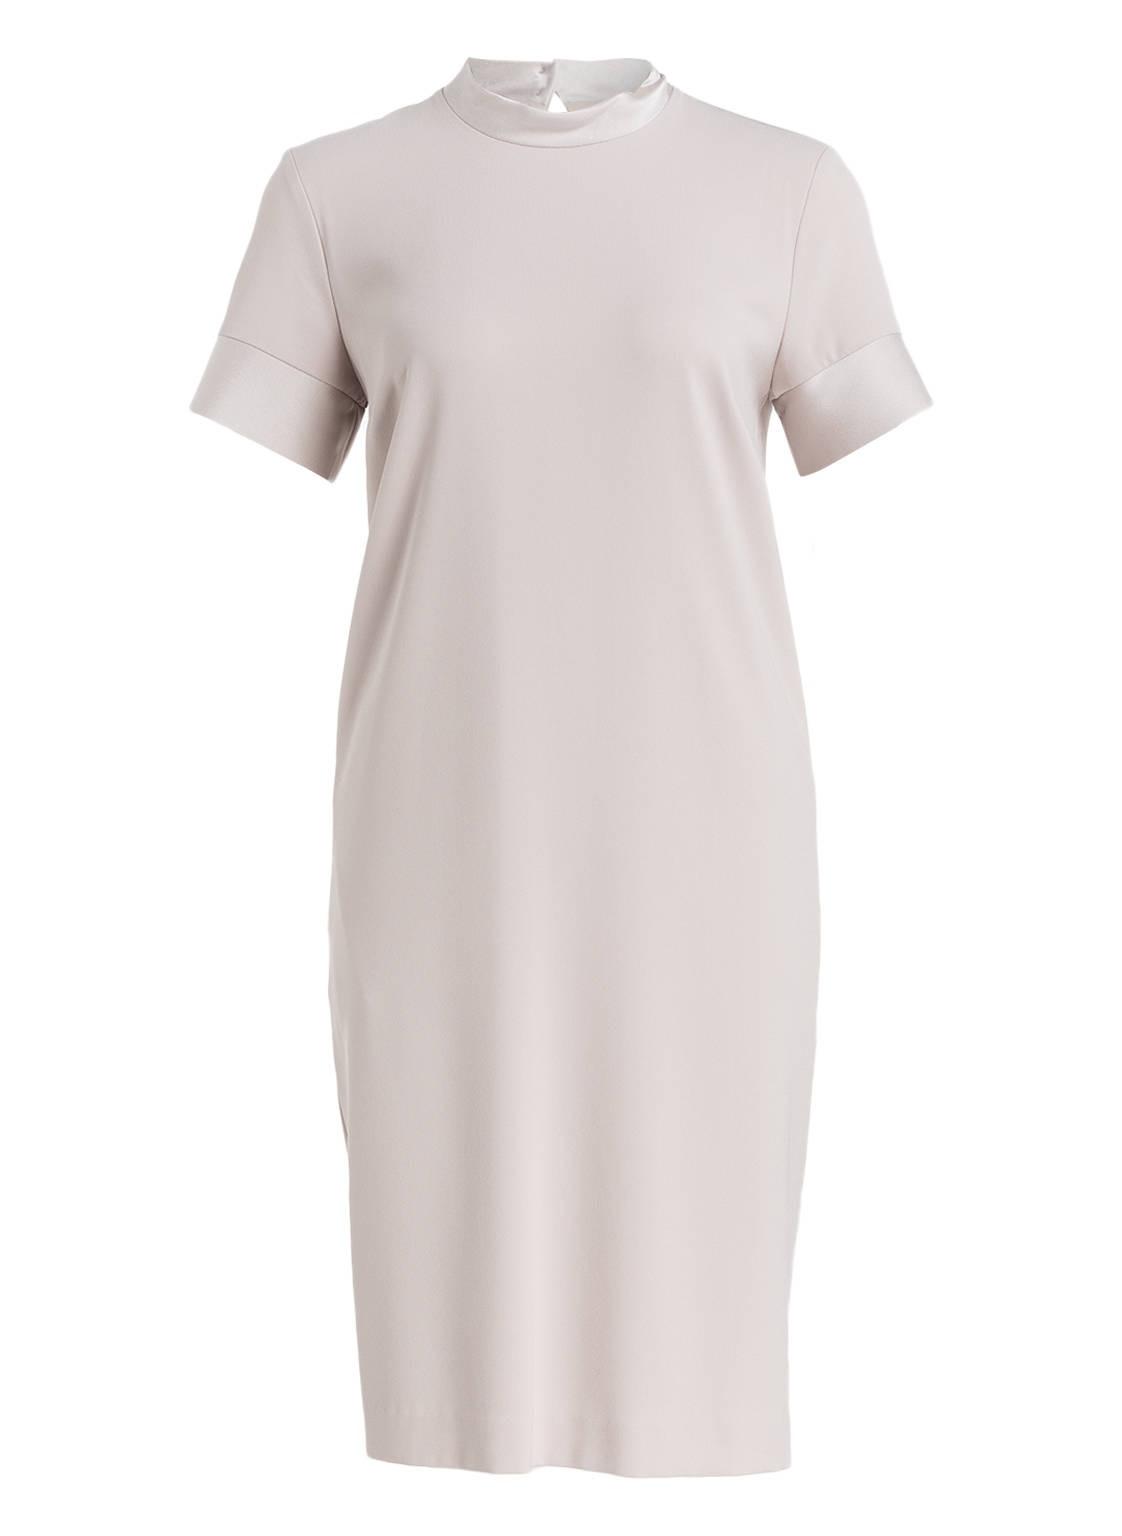 Top Damen Kleider Knielang Ärmel17 Luxus Damen Kleider Knielang Boutique